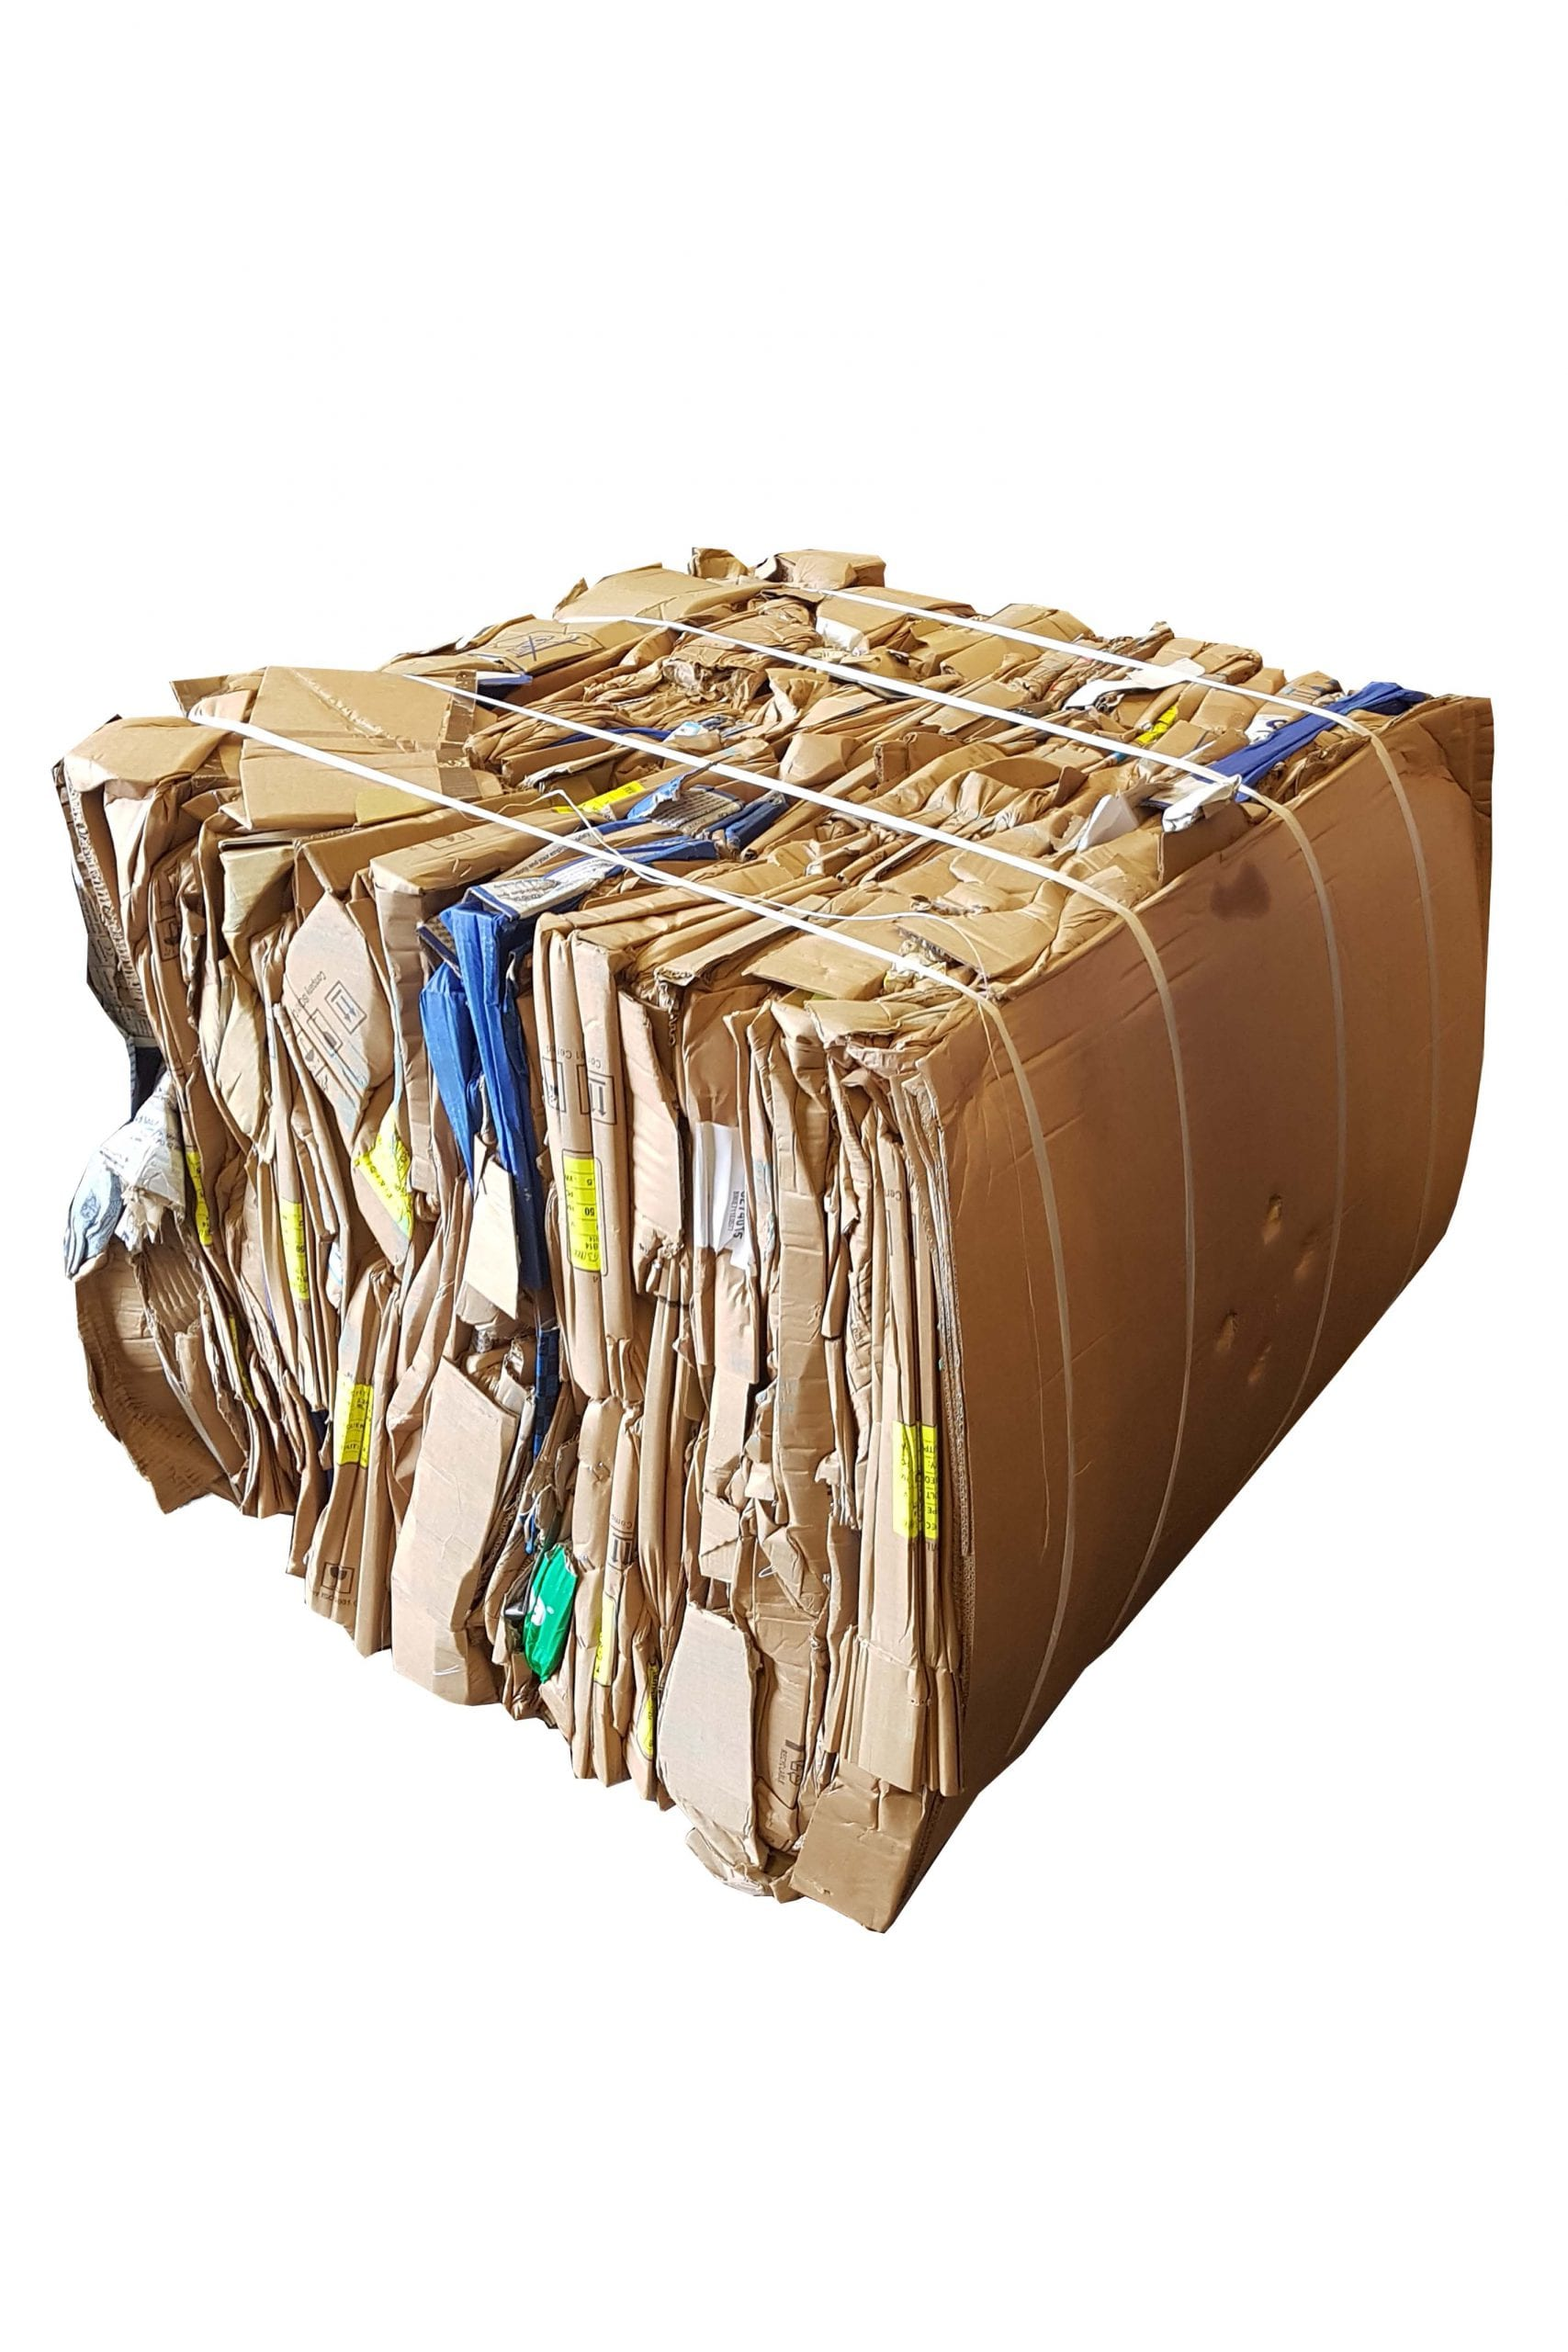 100 kg bale cardboard